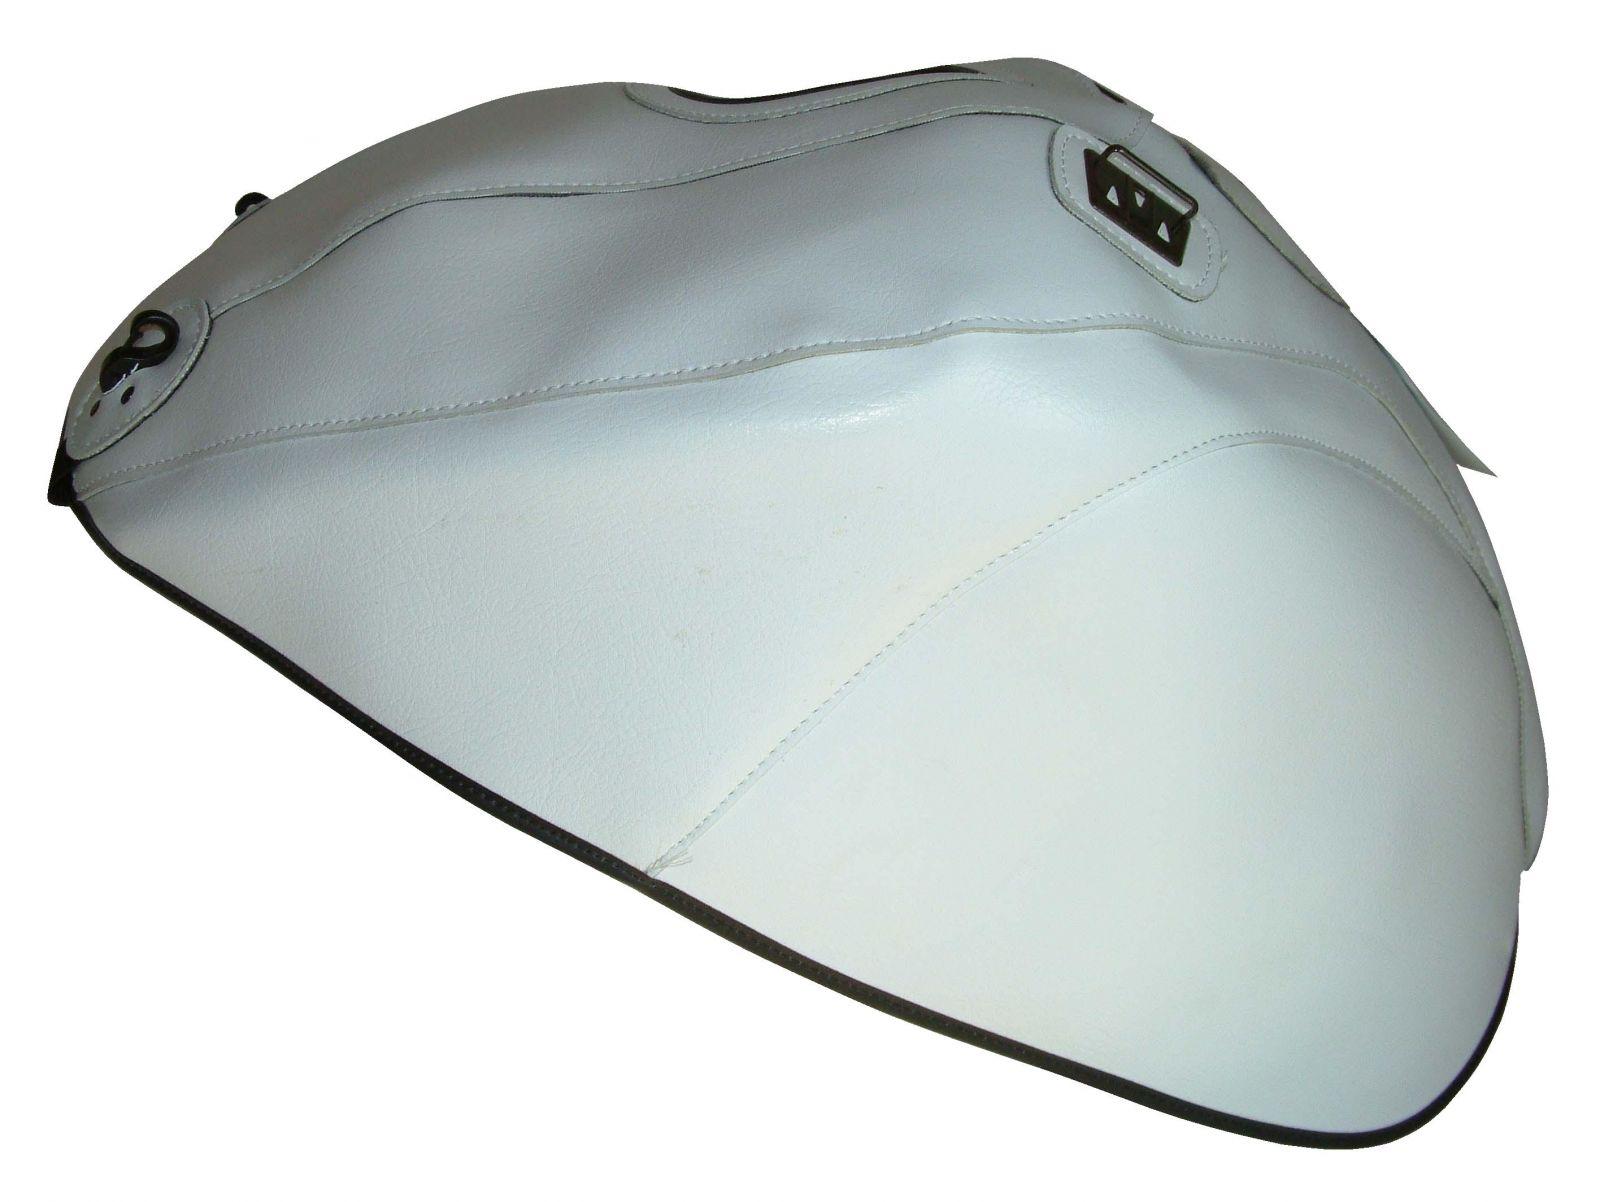 Capa de depósito TPR5750 - SUZUKI SV 650 S/N [2003-2005]